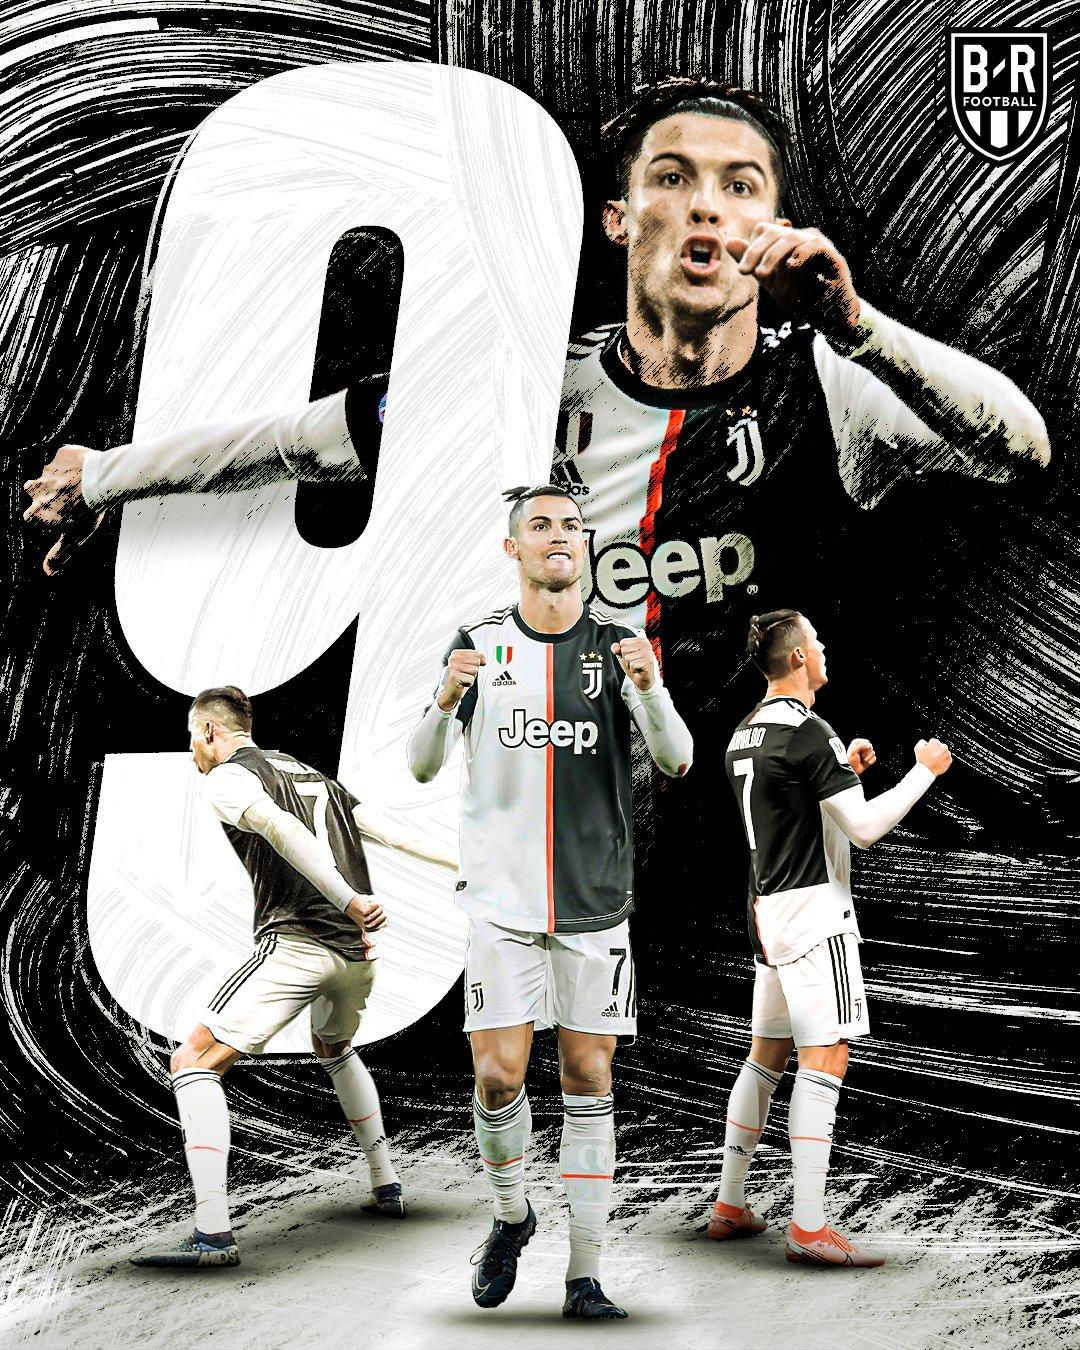 Football 2020 Wallpapers Wallpaper Cave